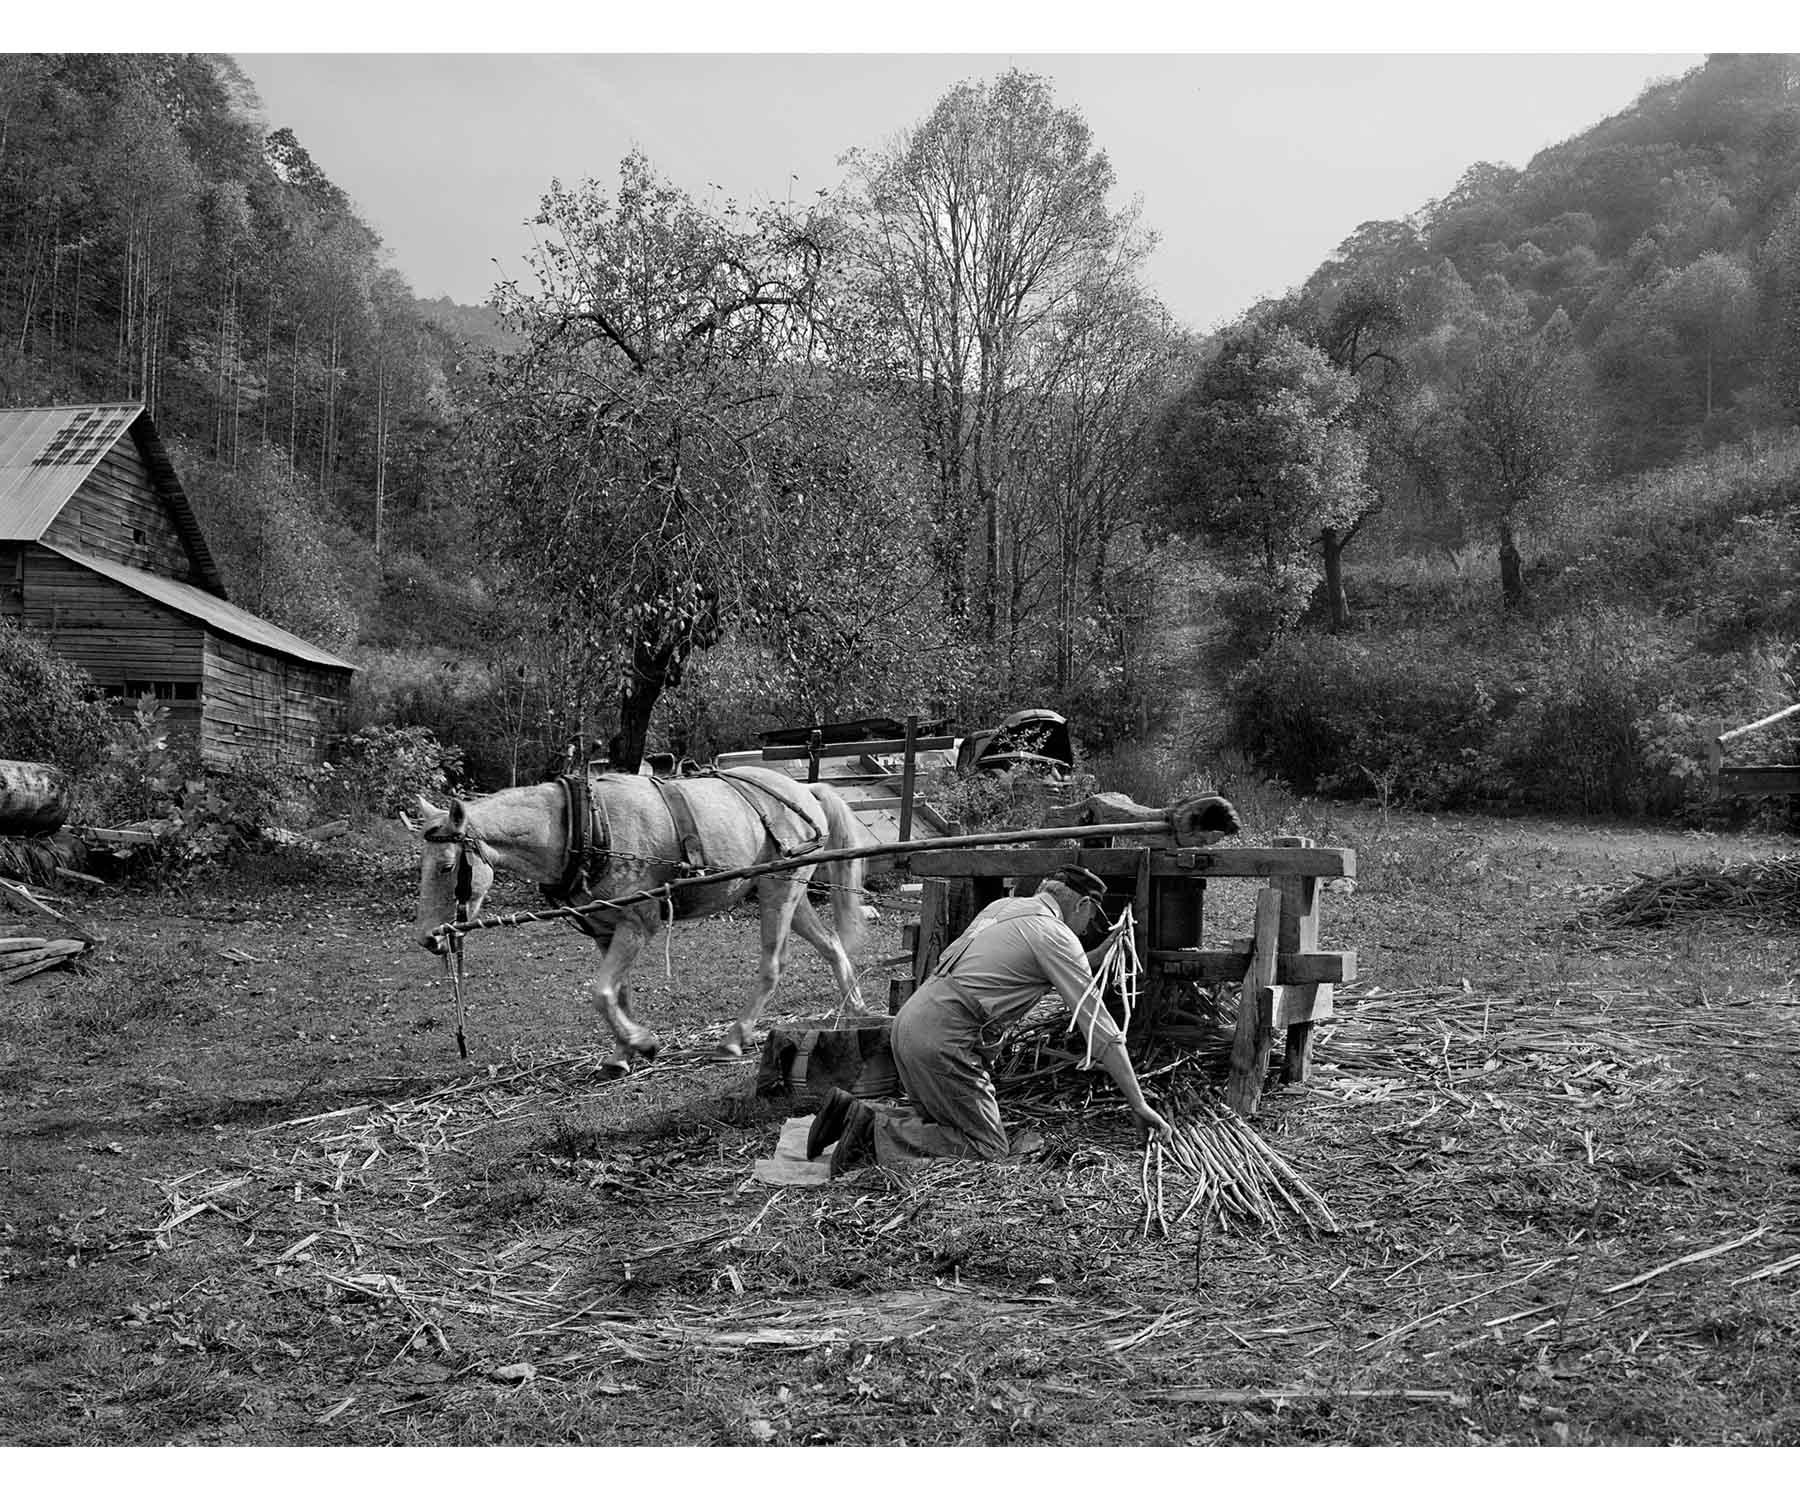 Appalachia Appalachian molasses making horse powered mill Tim Barnwell photographer